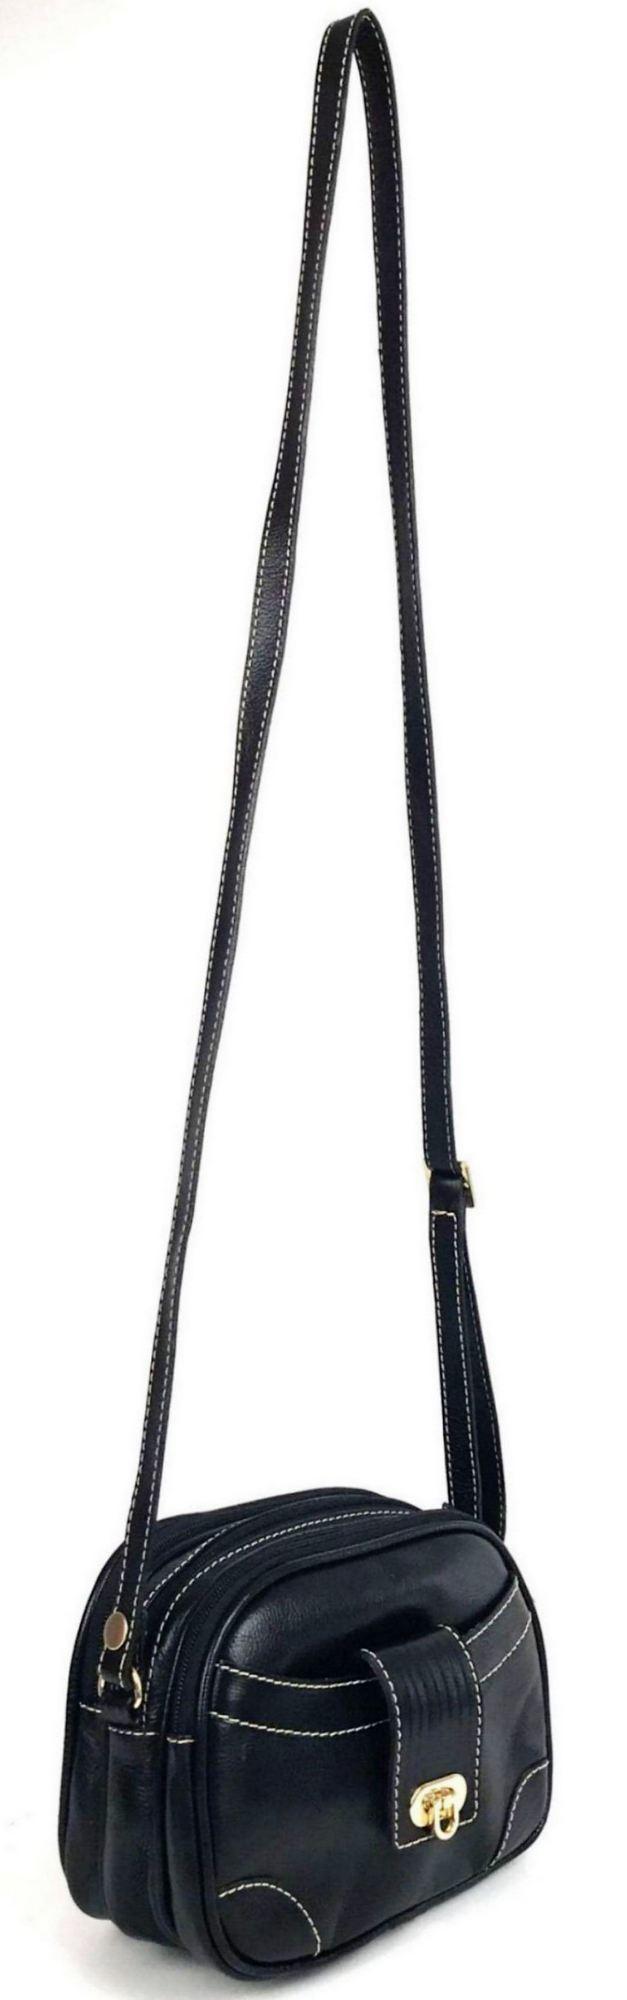 Bolsa de Couro Feminina Tiracolo Pequena Preta HB510 | HAMISH